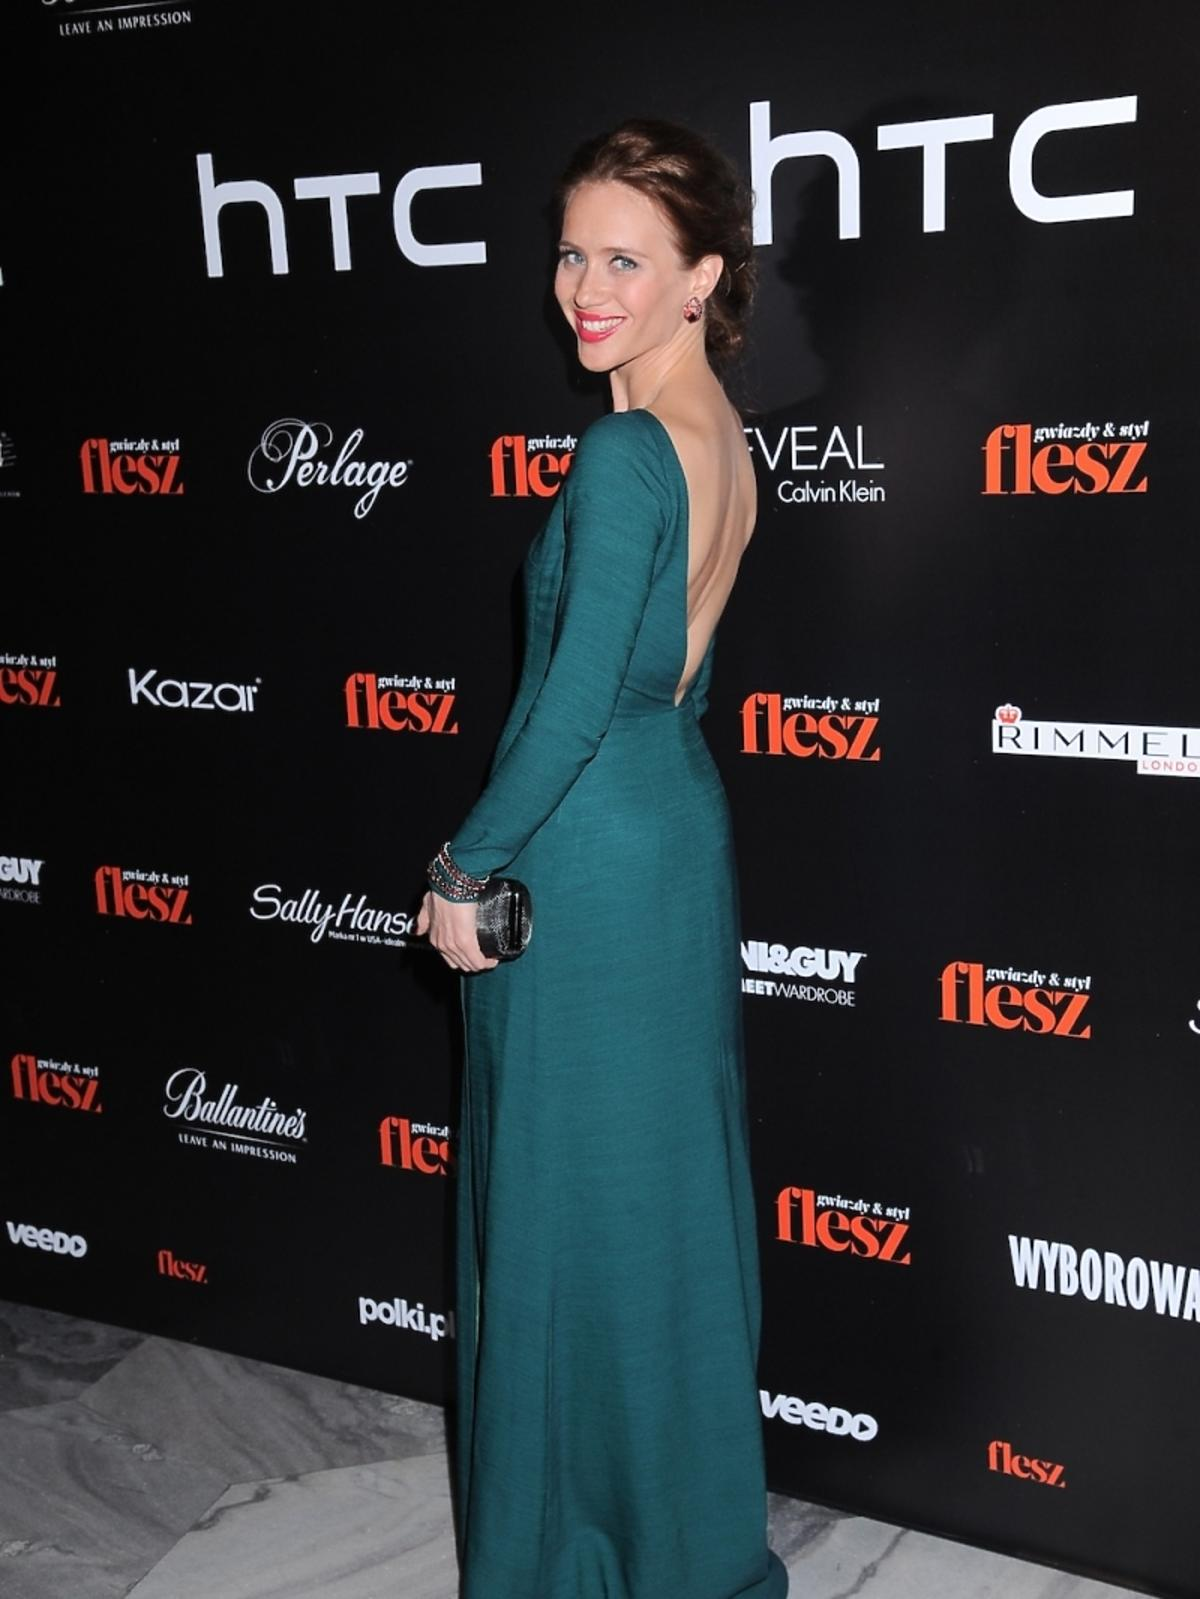 Hanna Konarowska na Flesz Fashion Night Symphony 2014